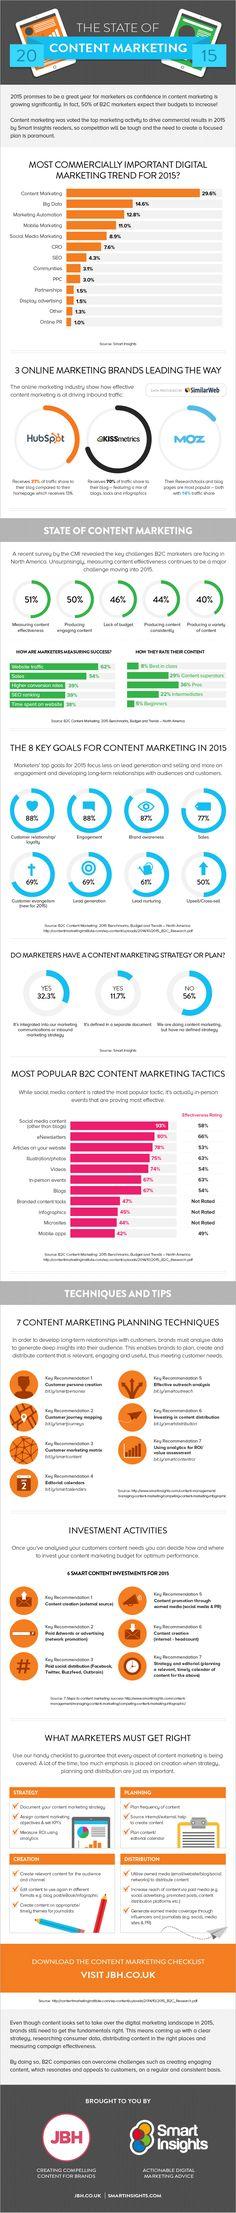 Content marketing strategic trends in 2015